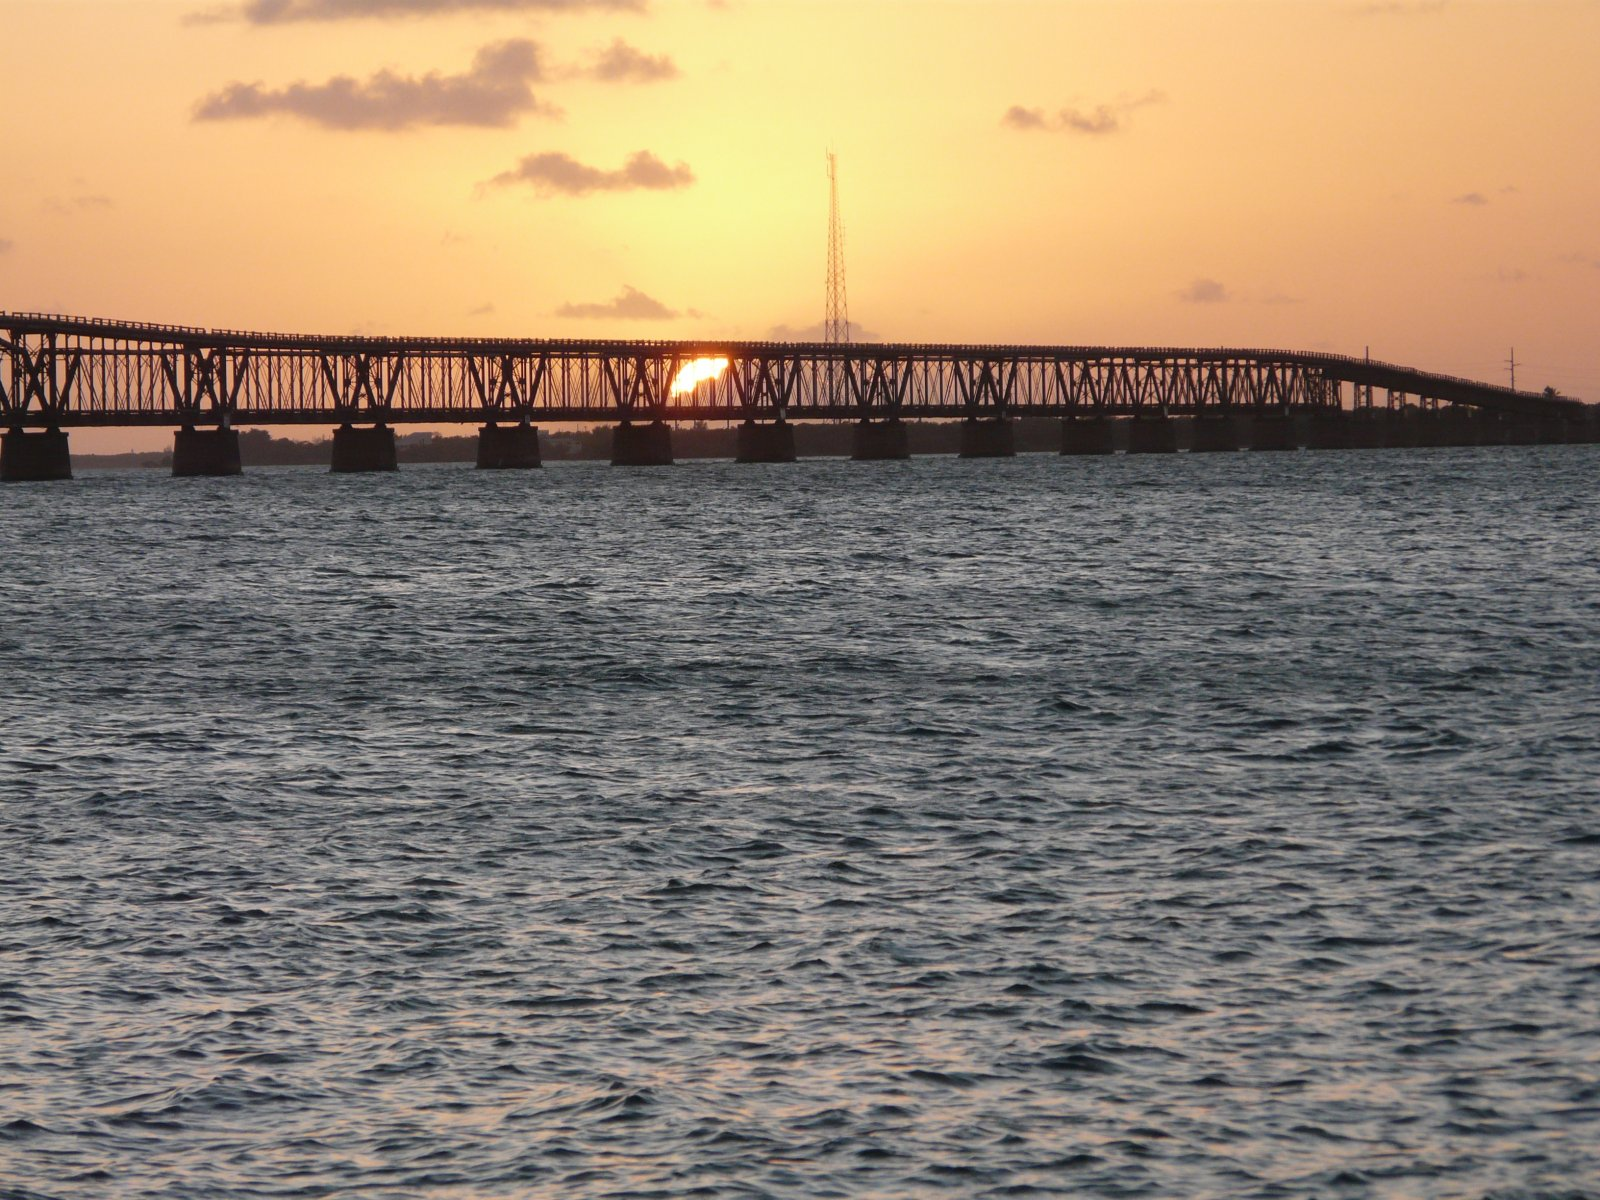 Click image for larger version  Name:BAHIA HONDA - FLA KEYS   NOV 09, 2011 11-2-2011 6-31-39 PM.jpg Views:128 Size:379.3 KB ID:36754